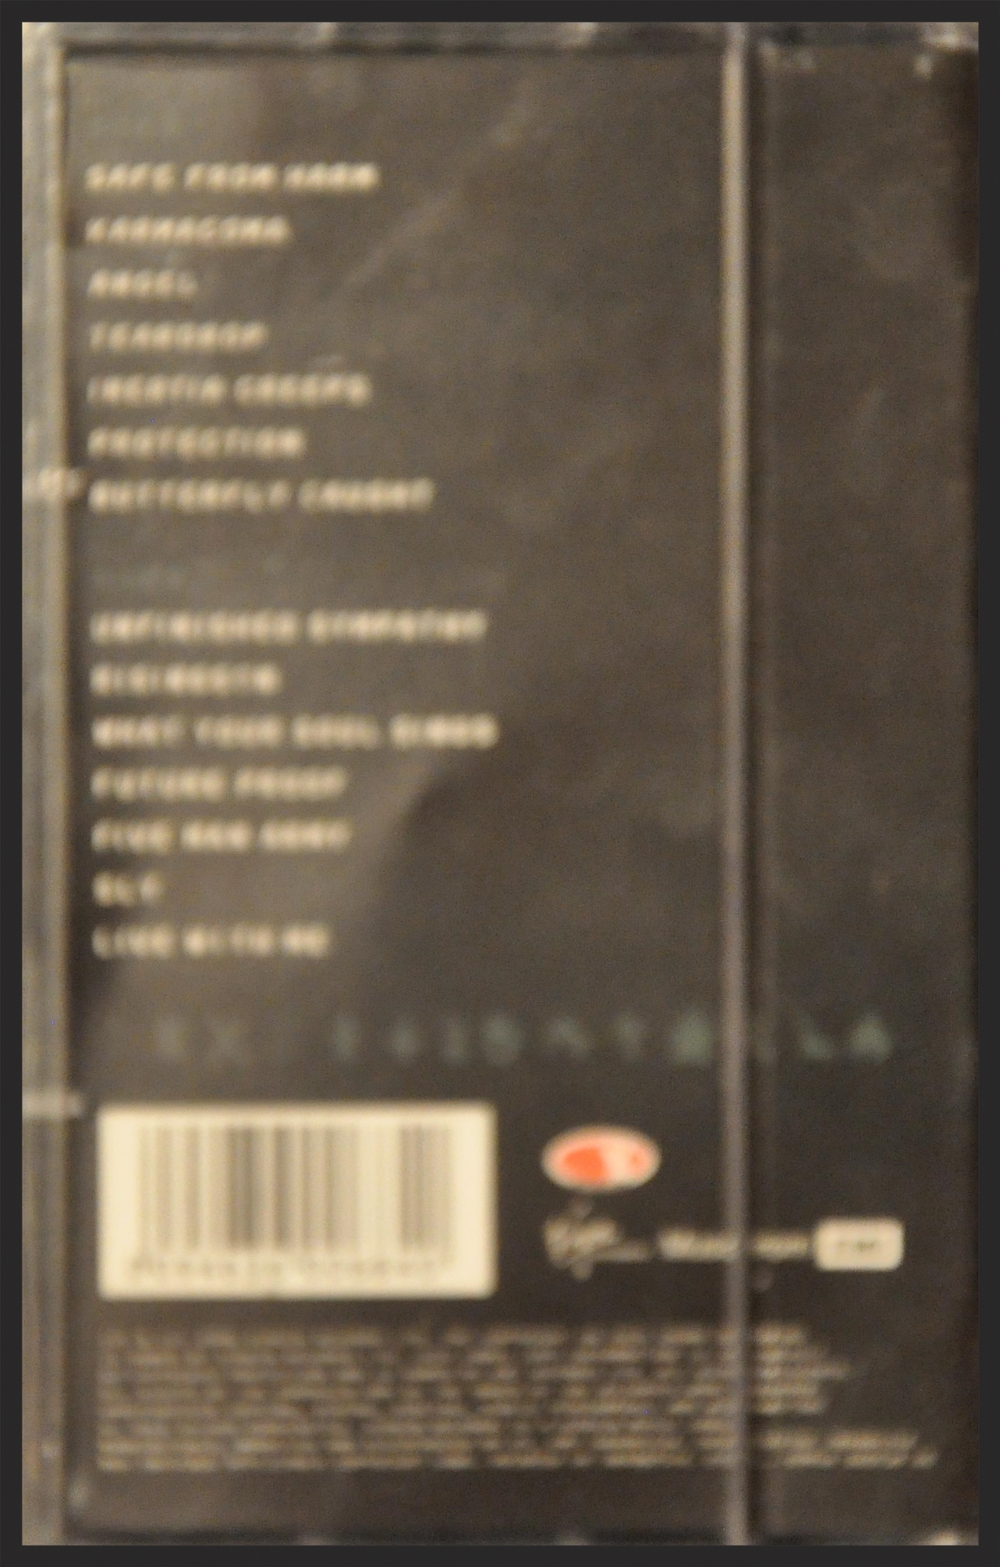 indonesianretailcassette-1304279647.jpg